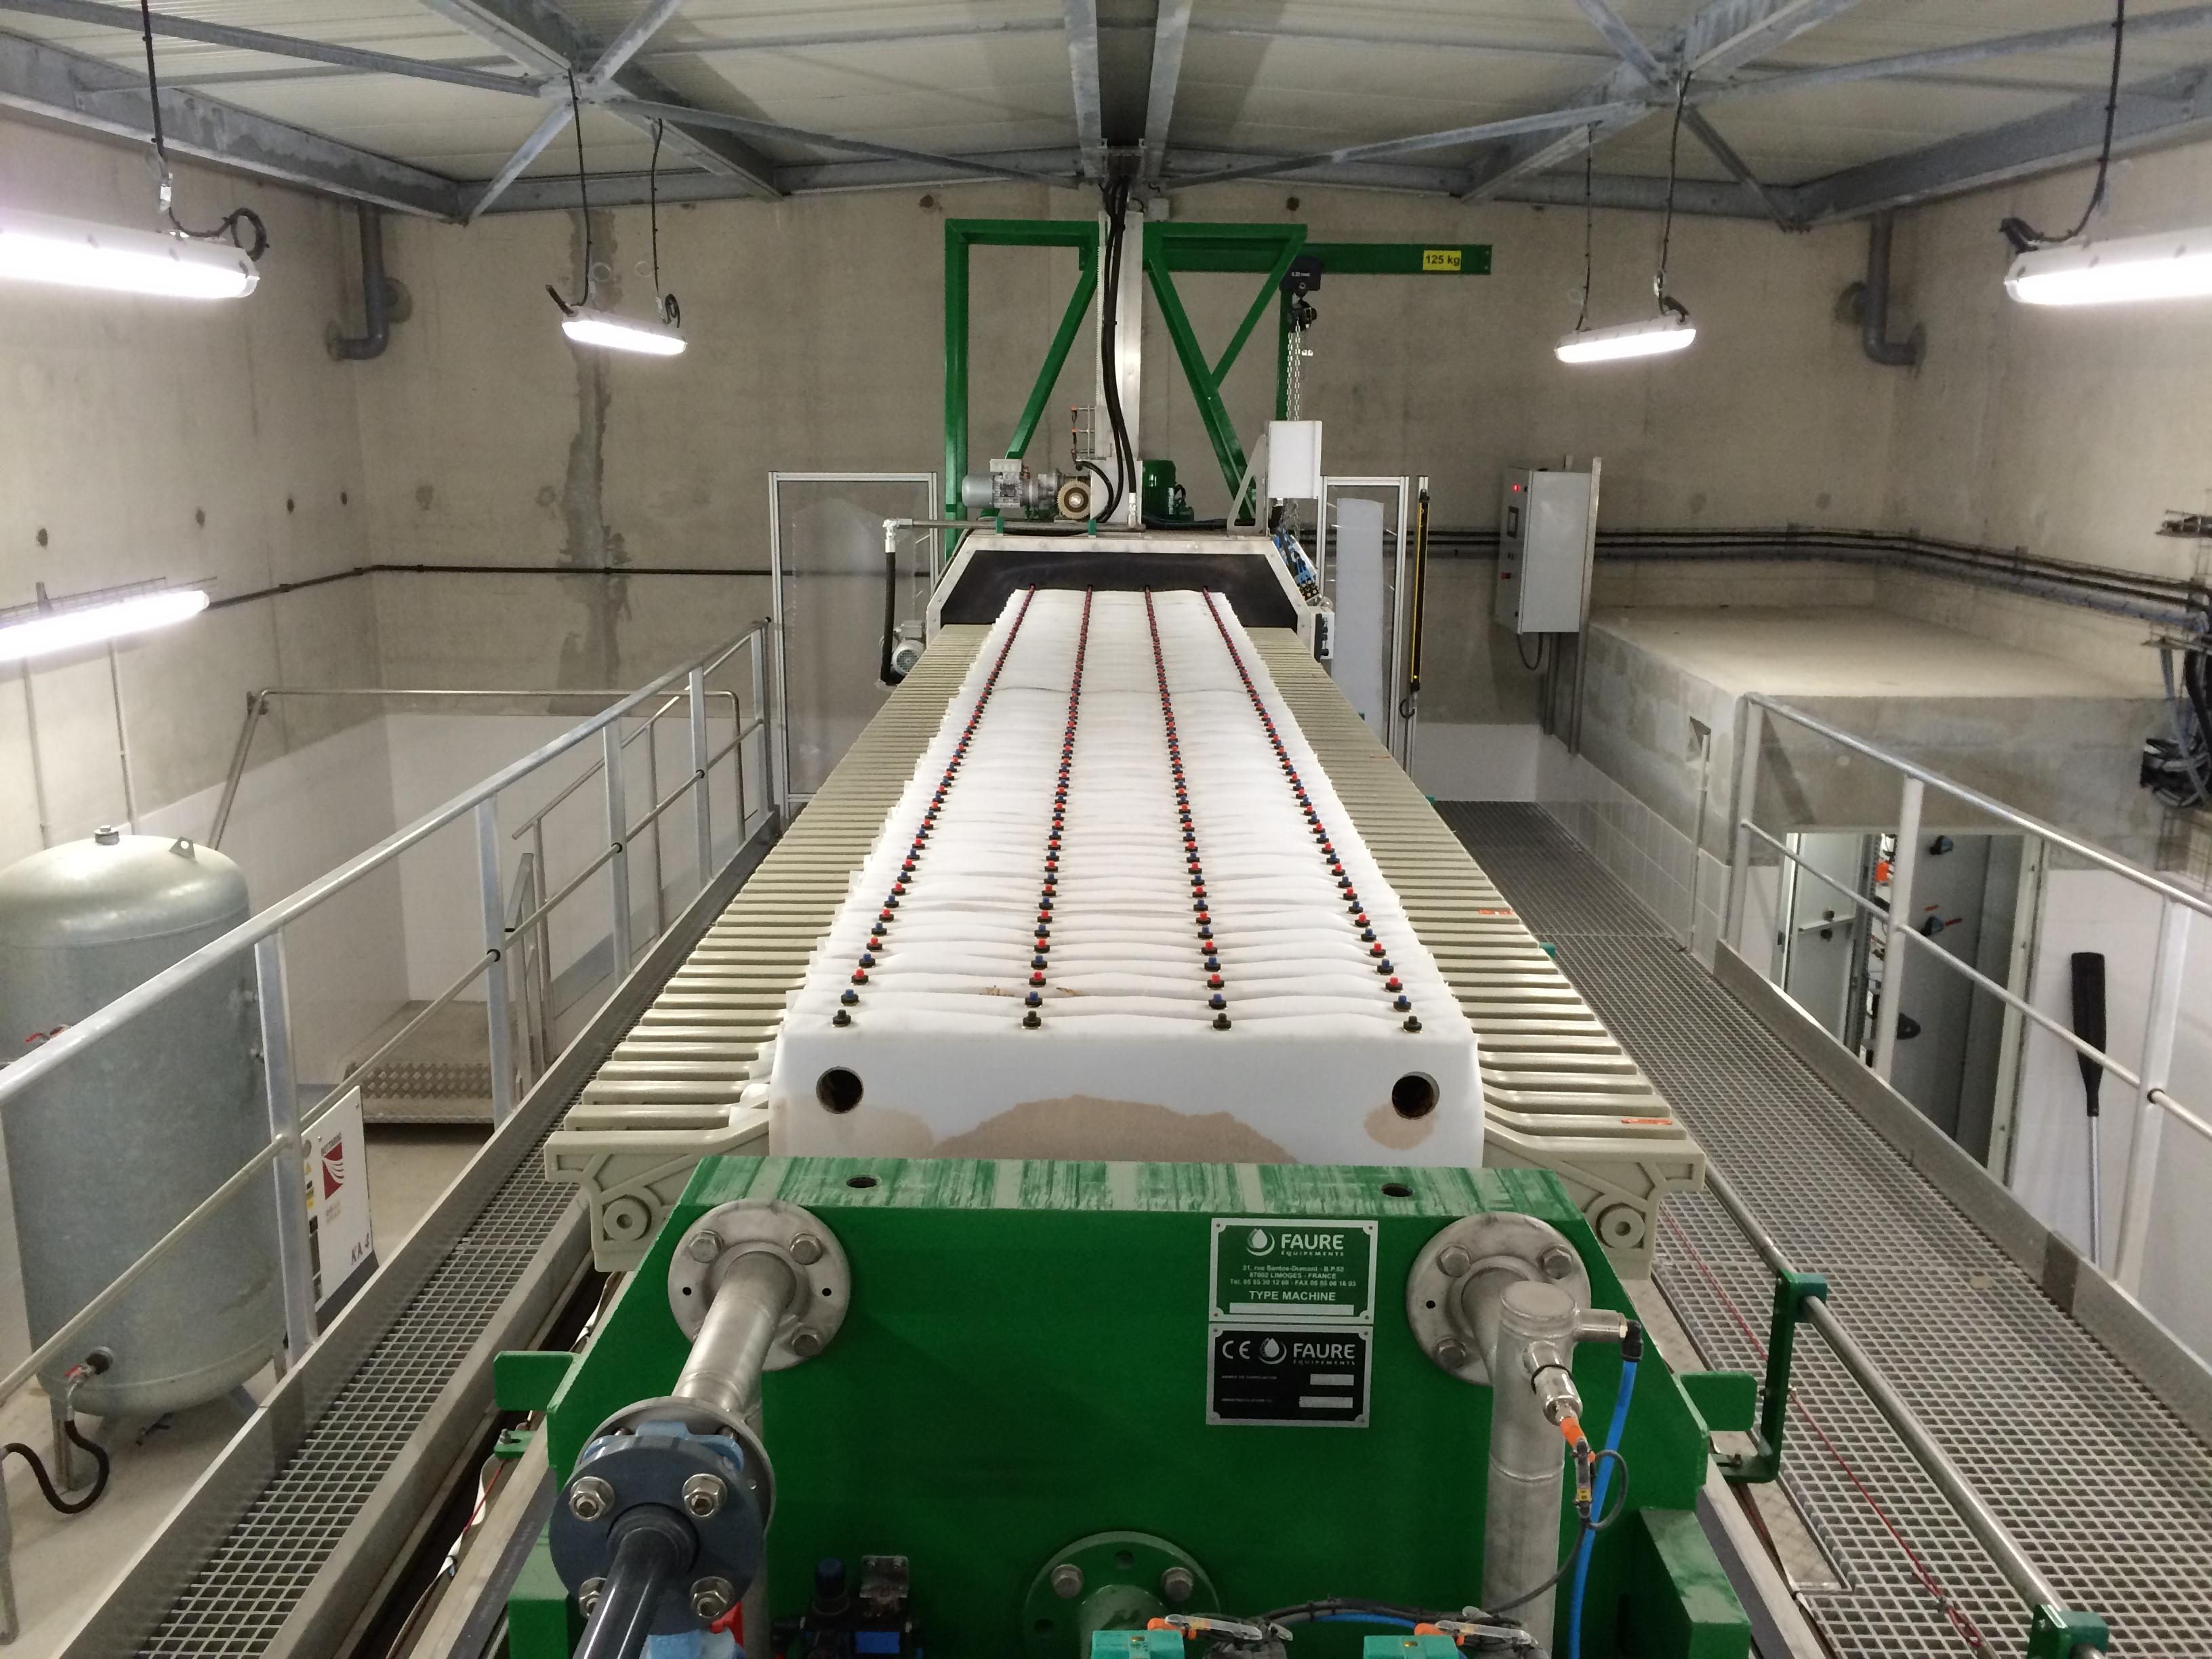 The Full Automatic Filter Press Faure Equipements En